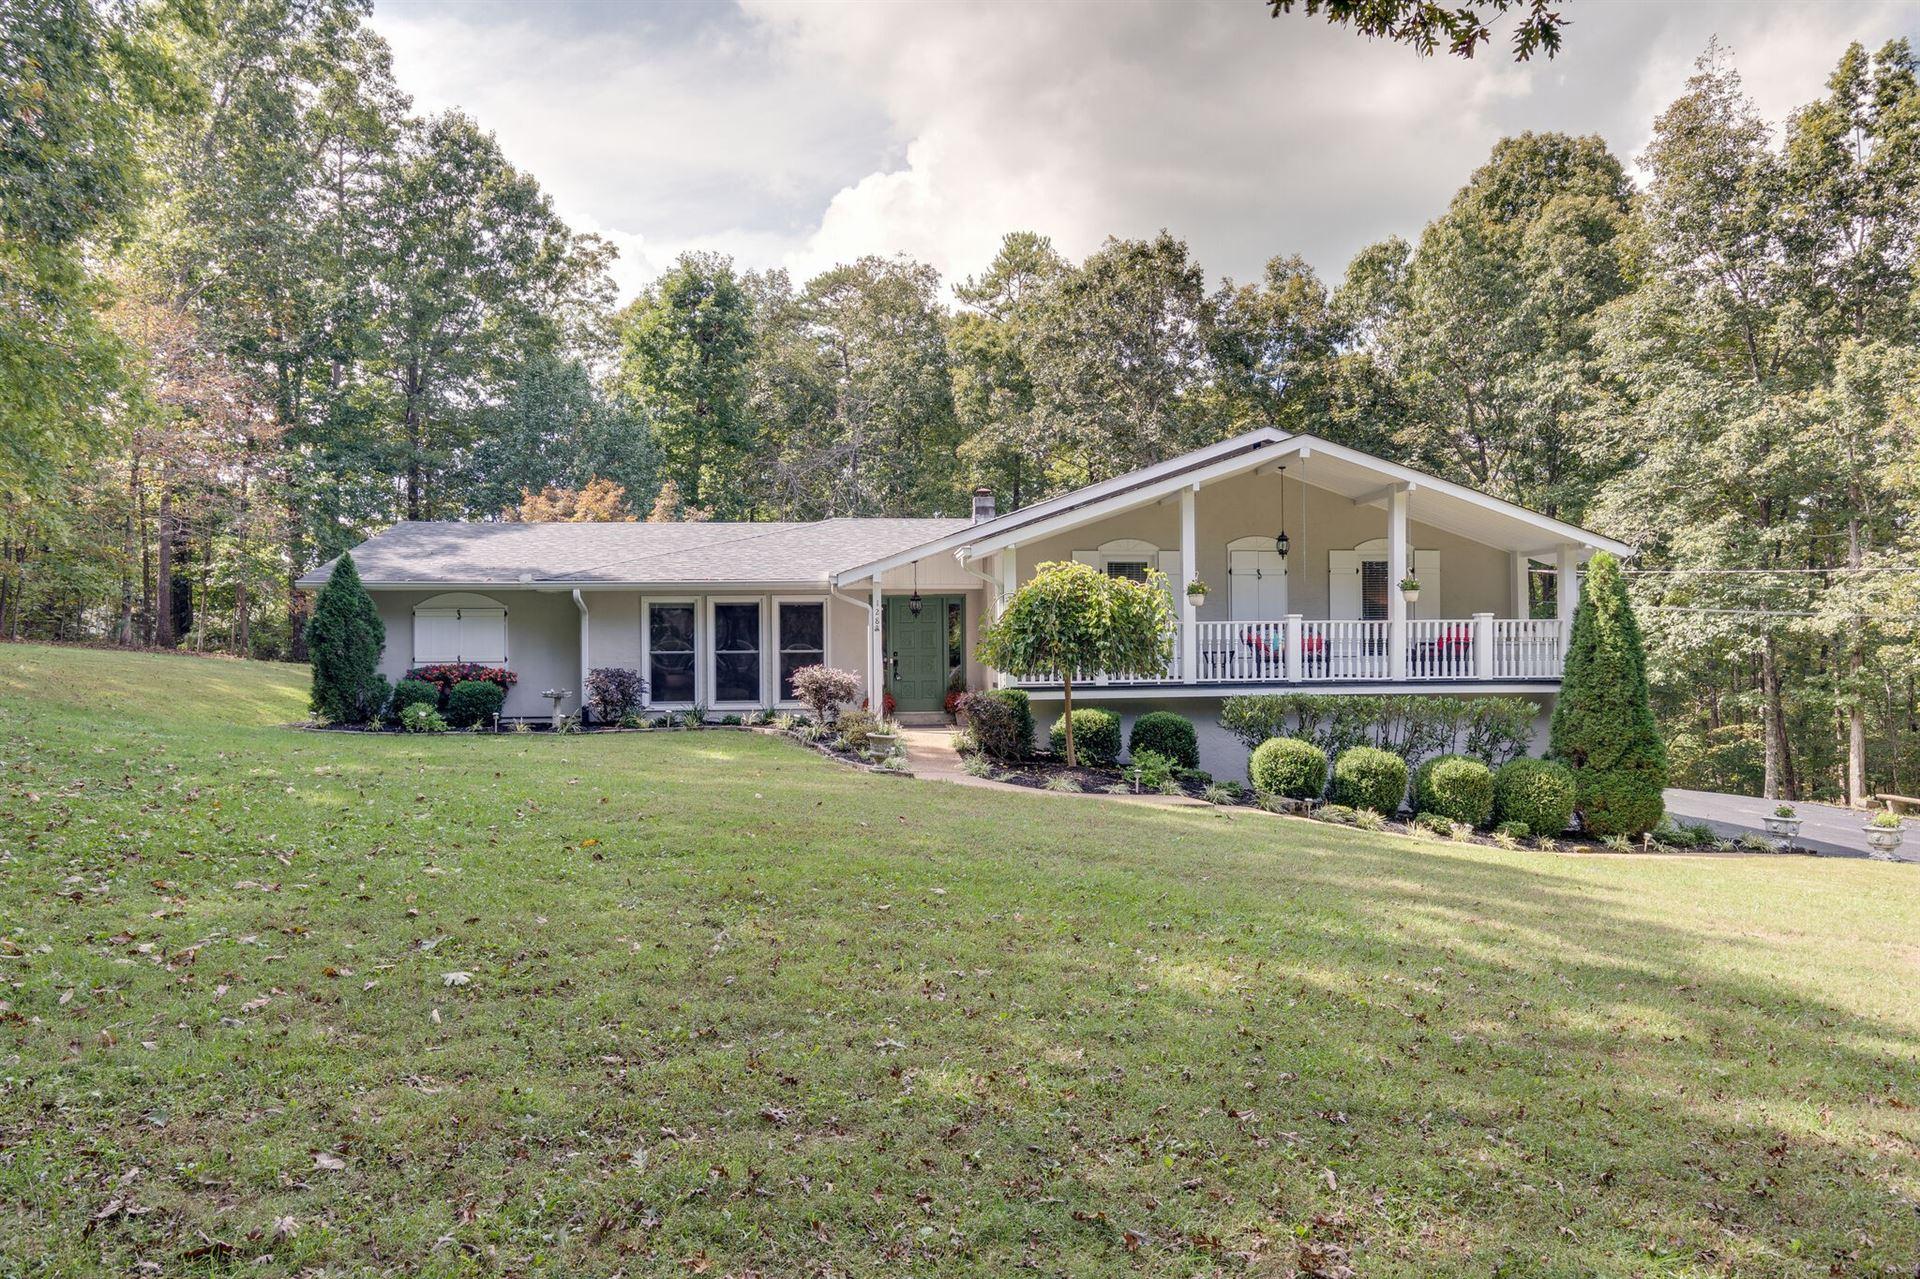 128 Indian Creek Rd, Hohenwald, TN 38462 - MLS#: 2297837